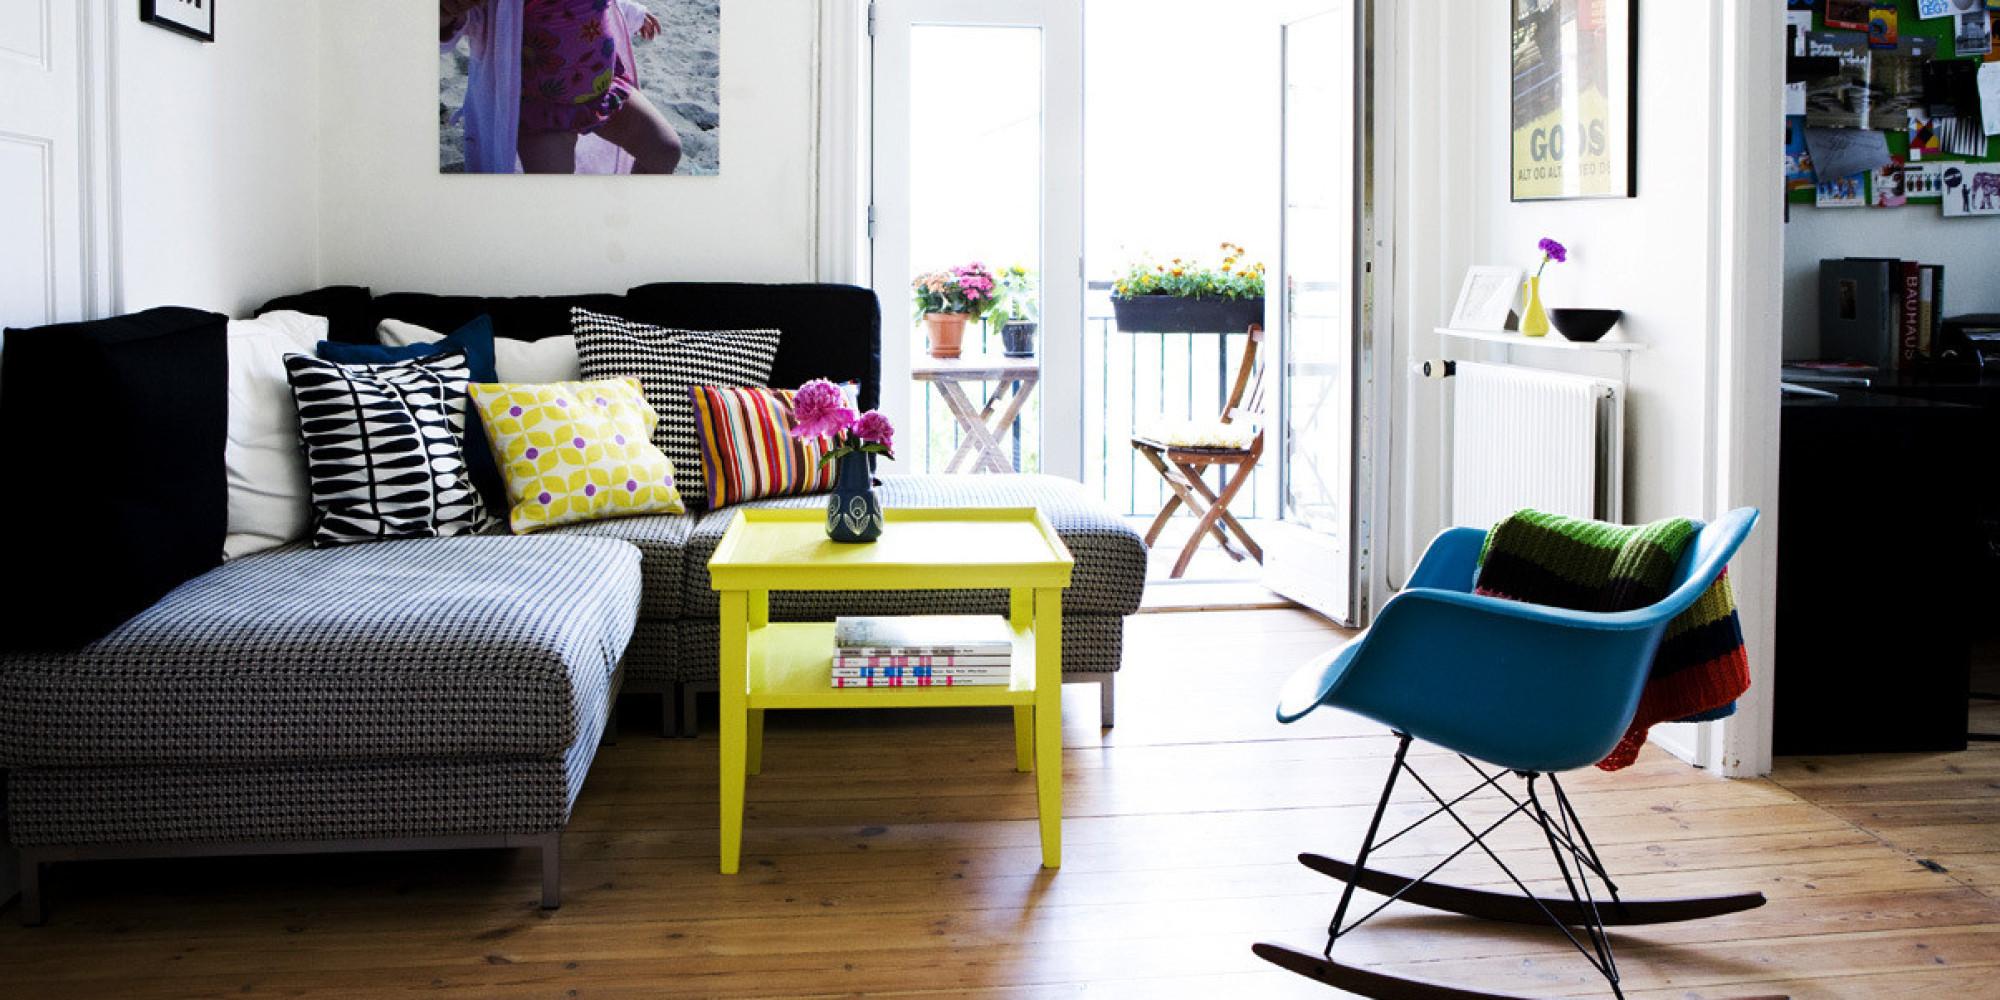 Living Room Club Ottawa Facebook